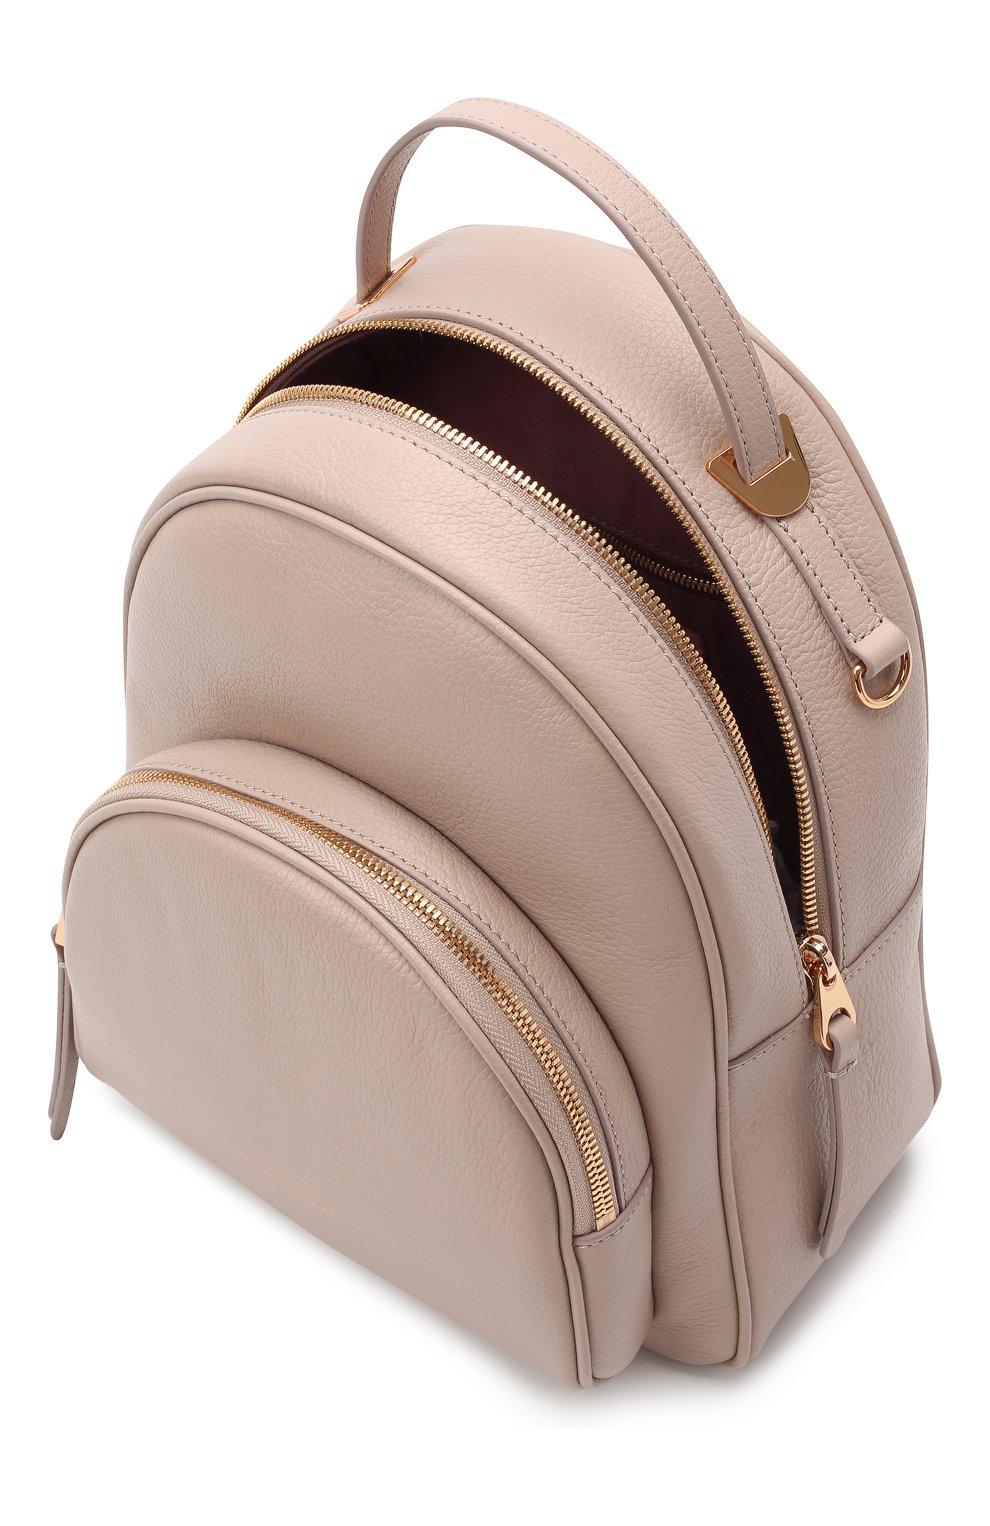 Женский рюкзак lea COCCINELLE бежевого цвета, арт. E1 H60 14 01 01 | Фото 4